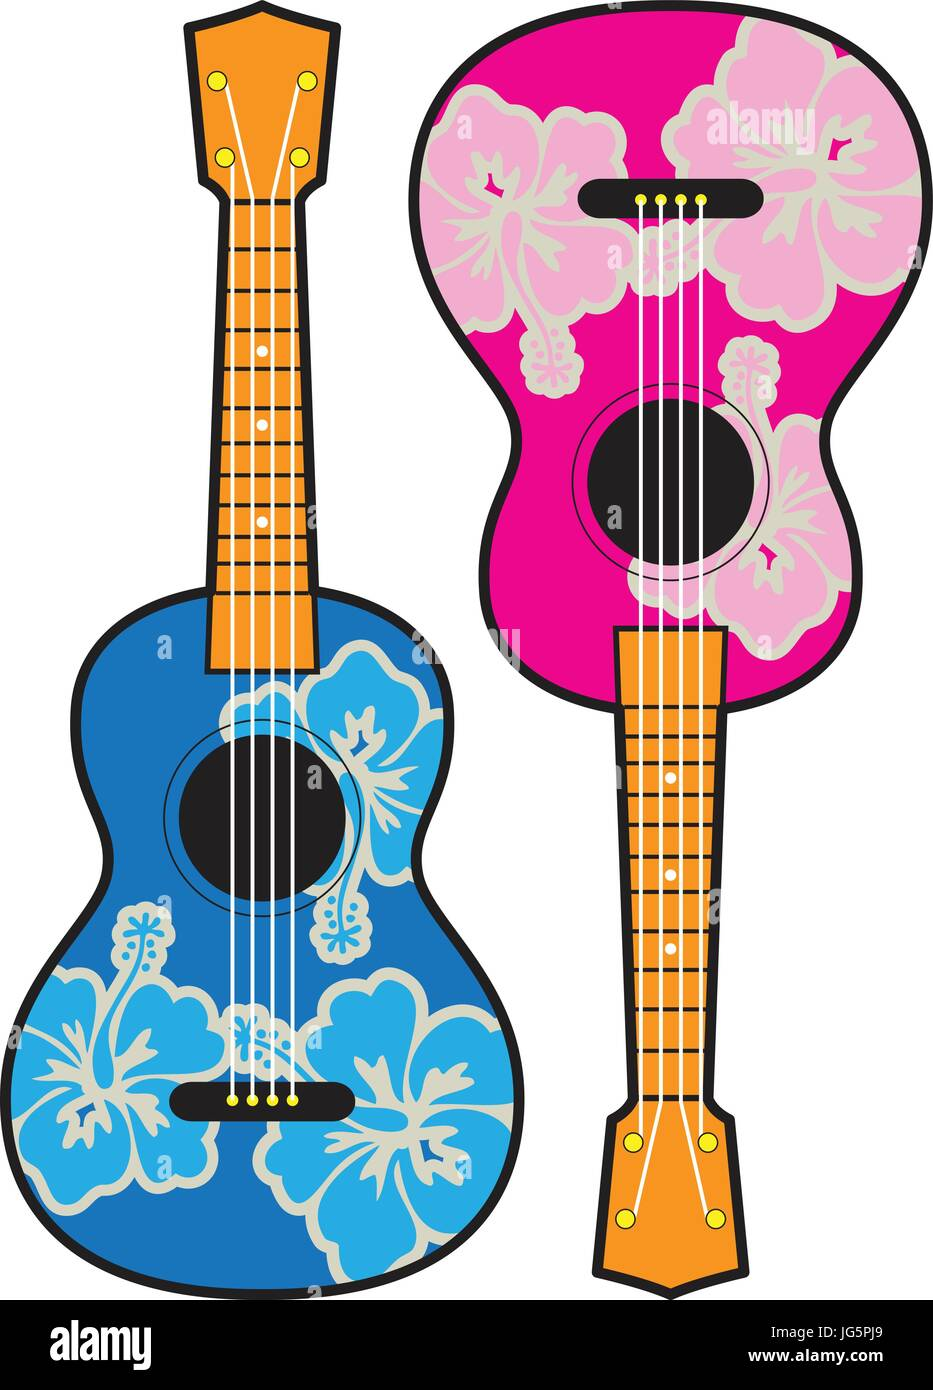 ukulele guitar vector with hibiscus design customizable - Stock Vector